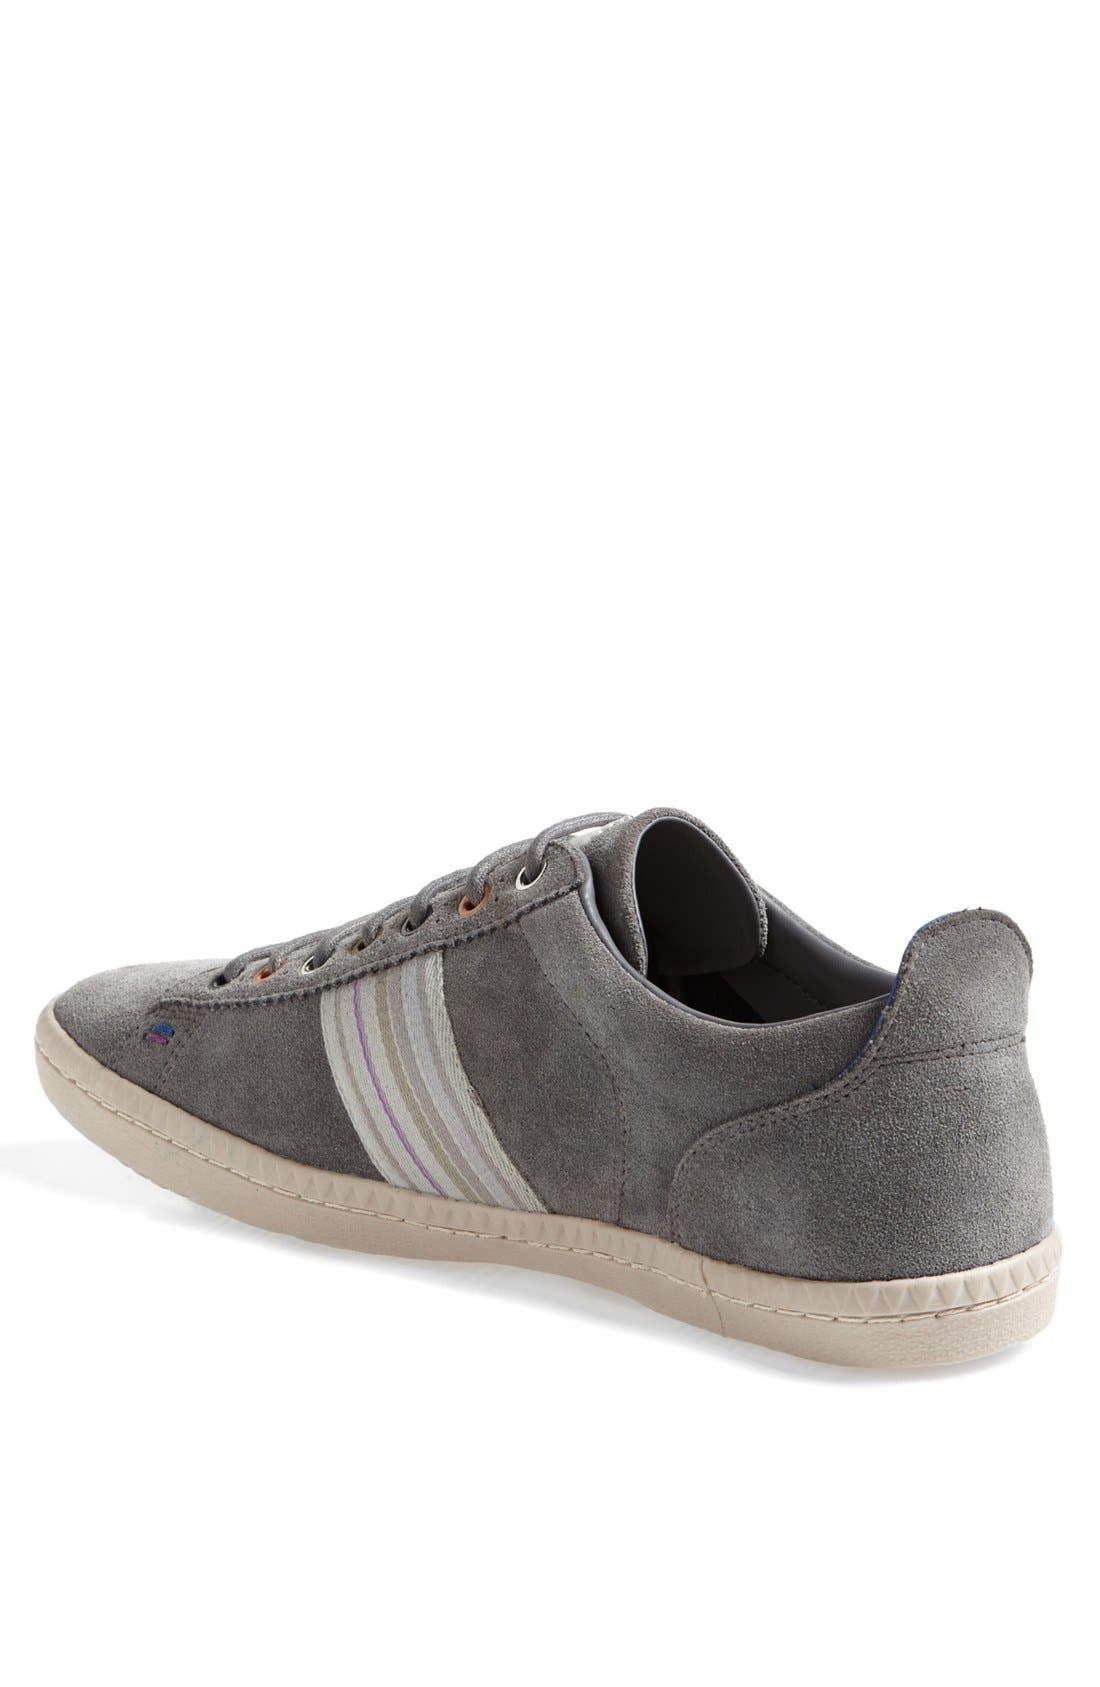 Alternate Image 2  - Paul Smith 'Osmo' Sneaker